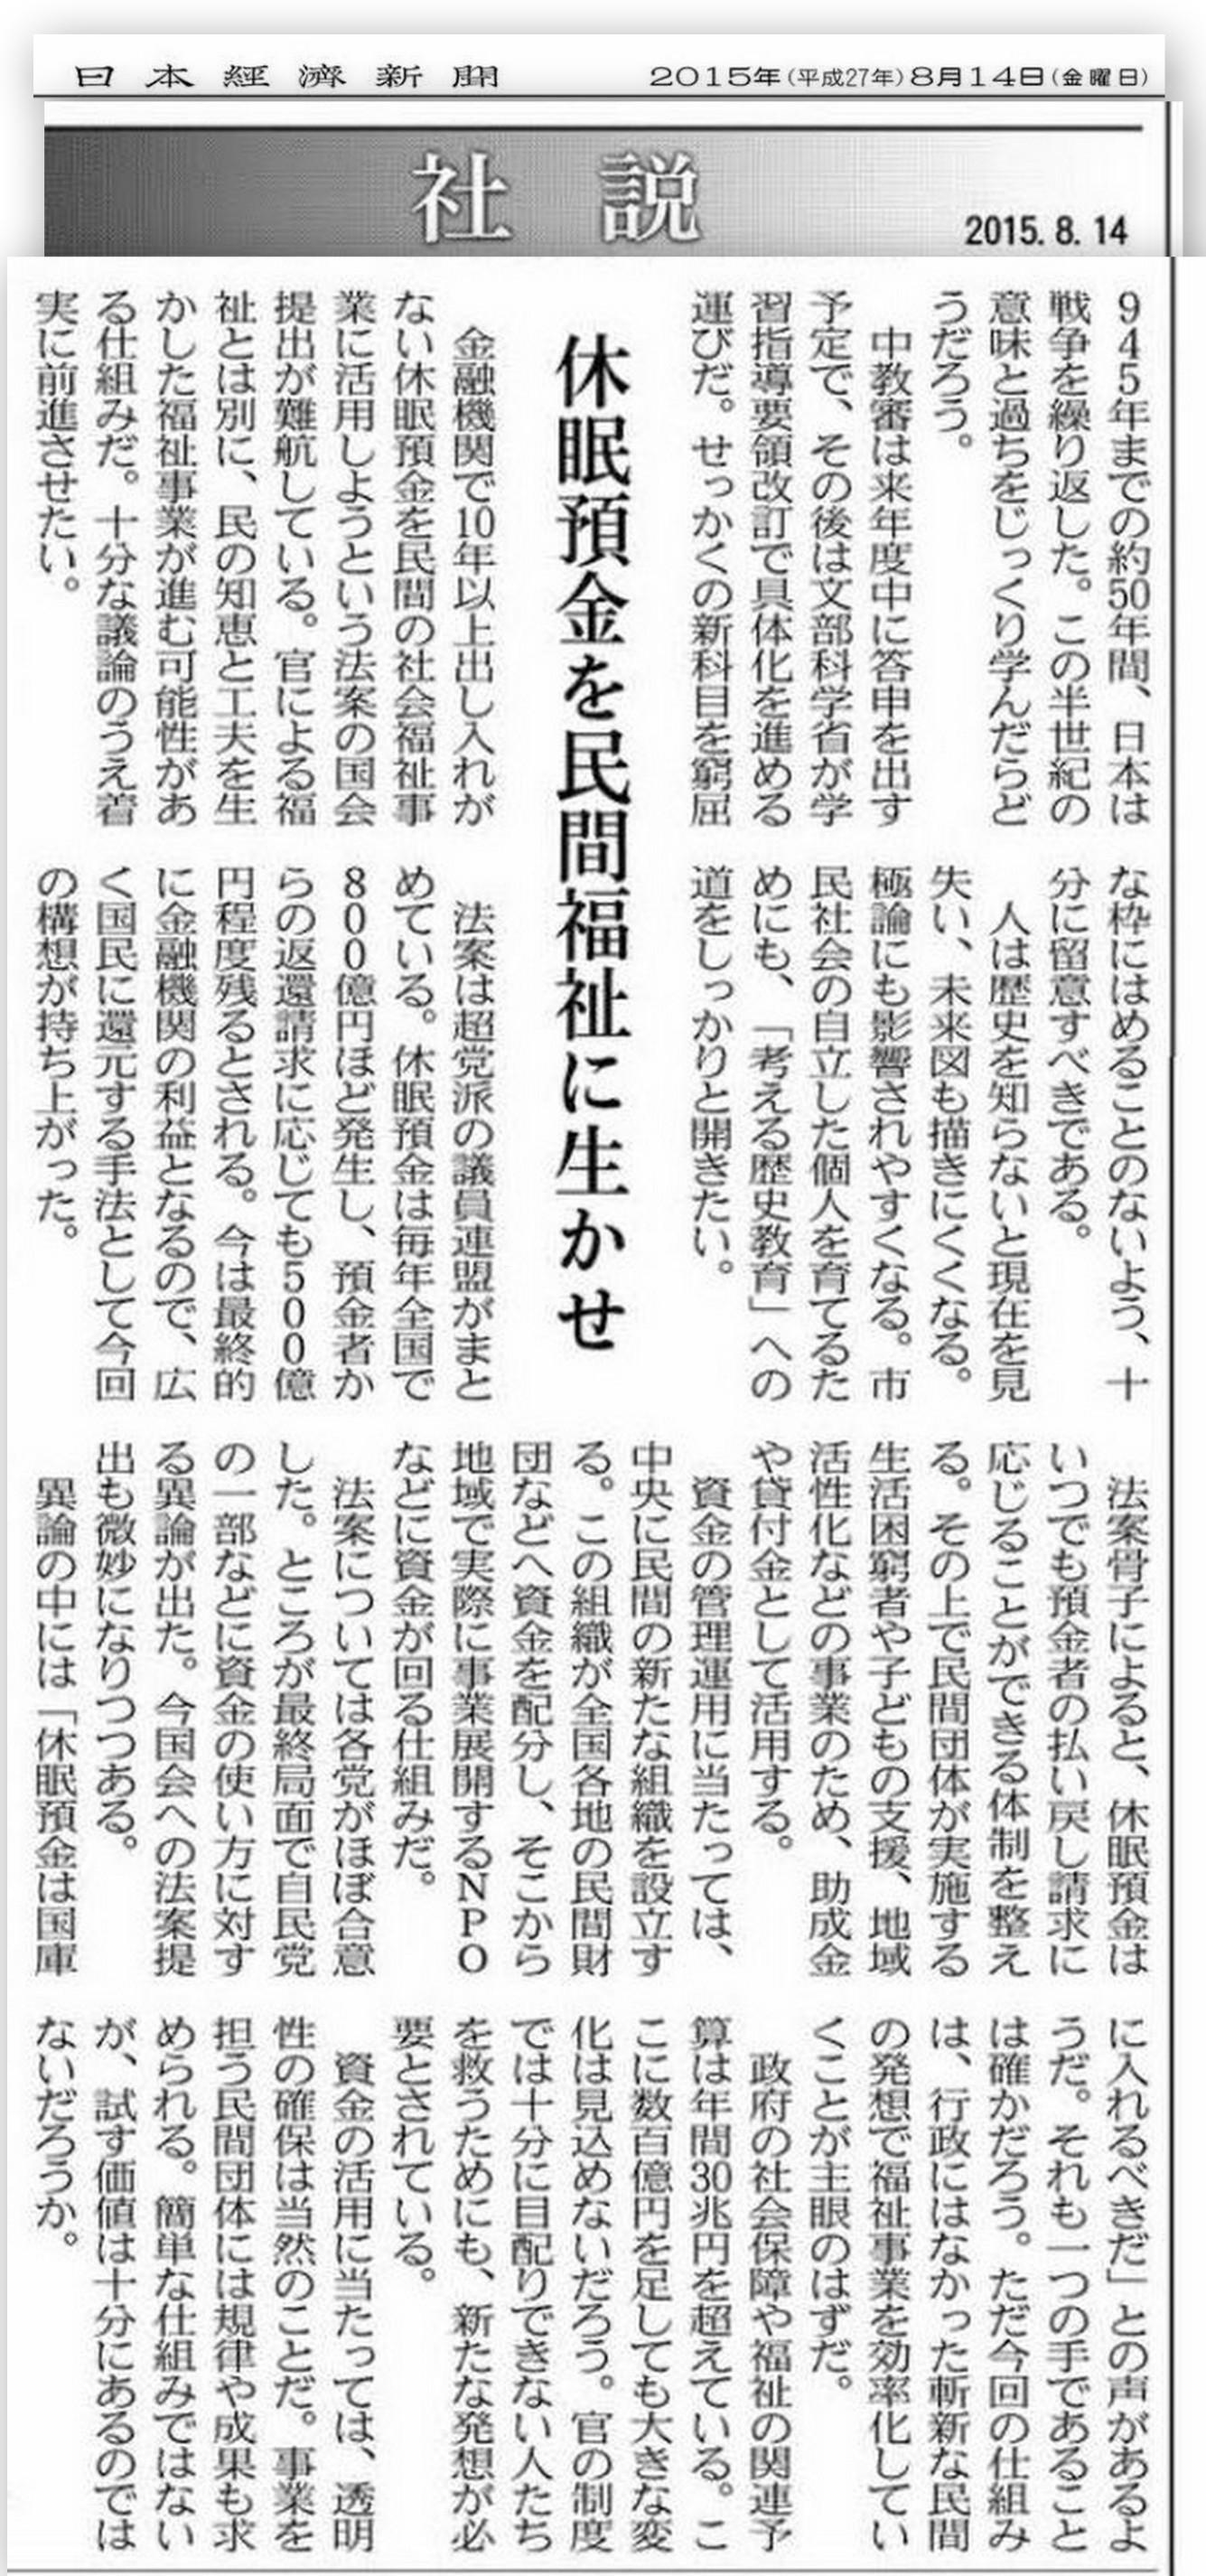 http://kyumin.jp/media/%E6%97%A5%E7%B5%8C%E6%96%B0%E8%81%9E%E7%A4%BE%E8%AA%AC%E3%82%B3%E3%83%A9%E3%83%BC%E3%82%B8%E3%83%A5%E6%B8%88_150814_2.jpg